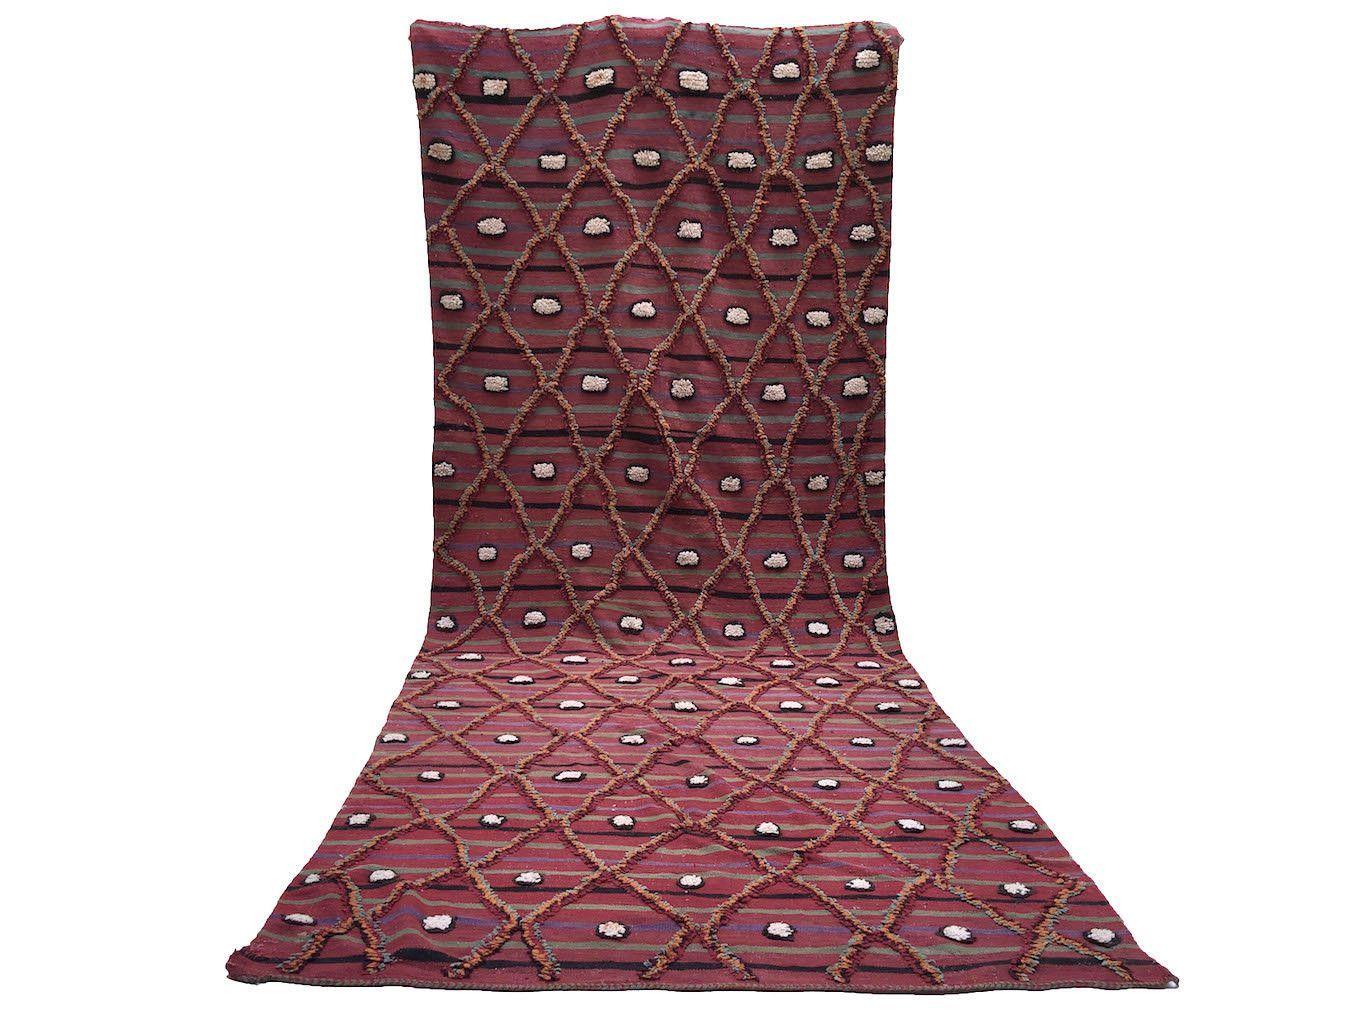 5x15 old vintage area long runner berber rug berber moroccan hallway rug hallway runner